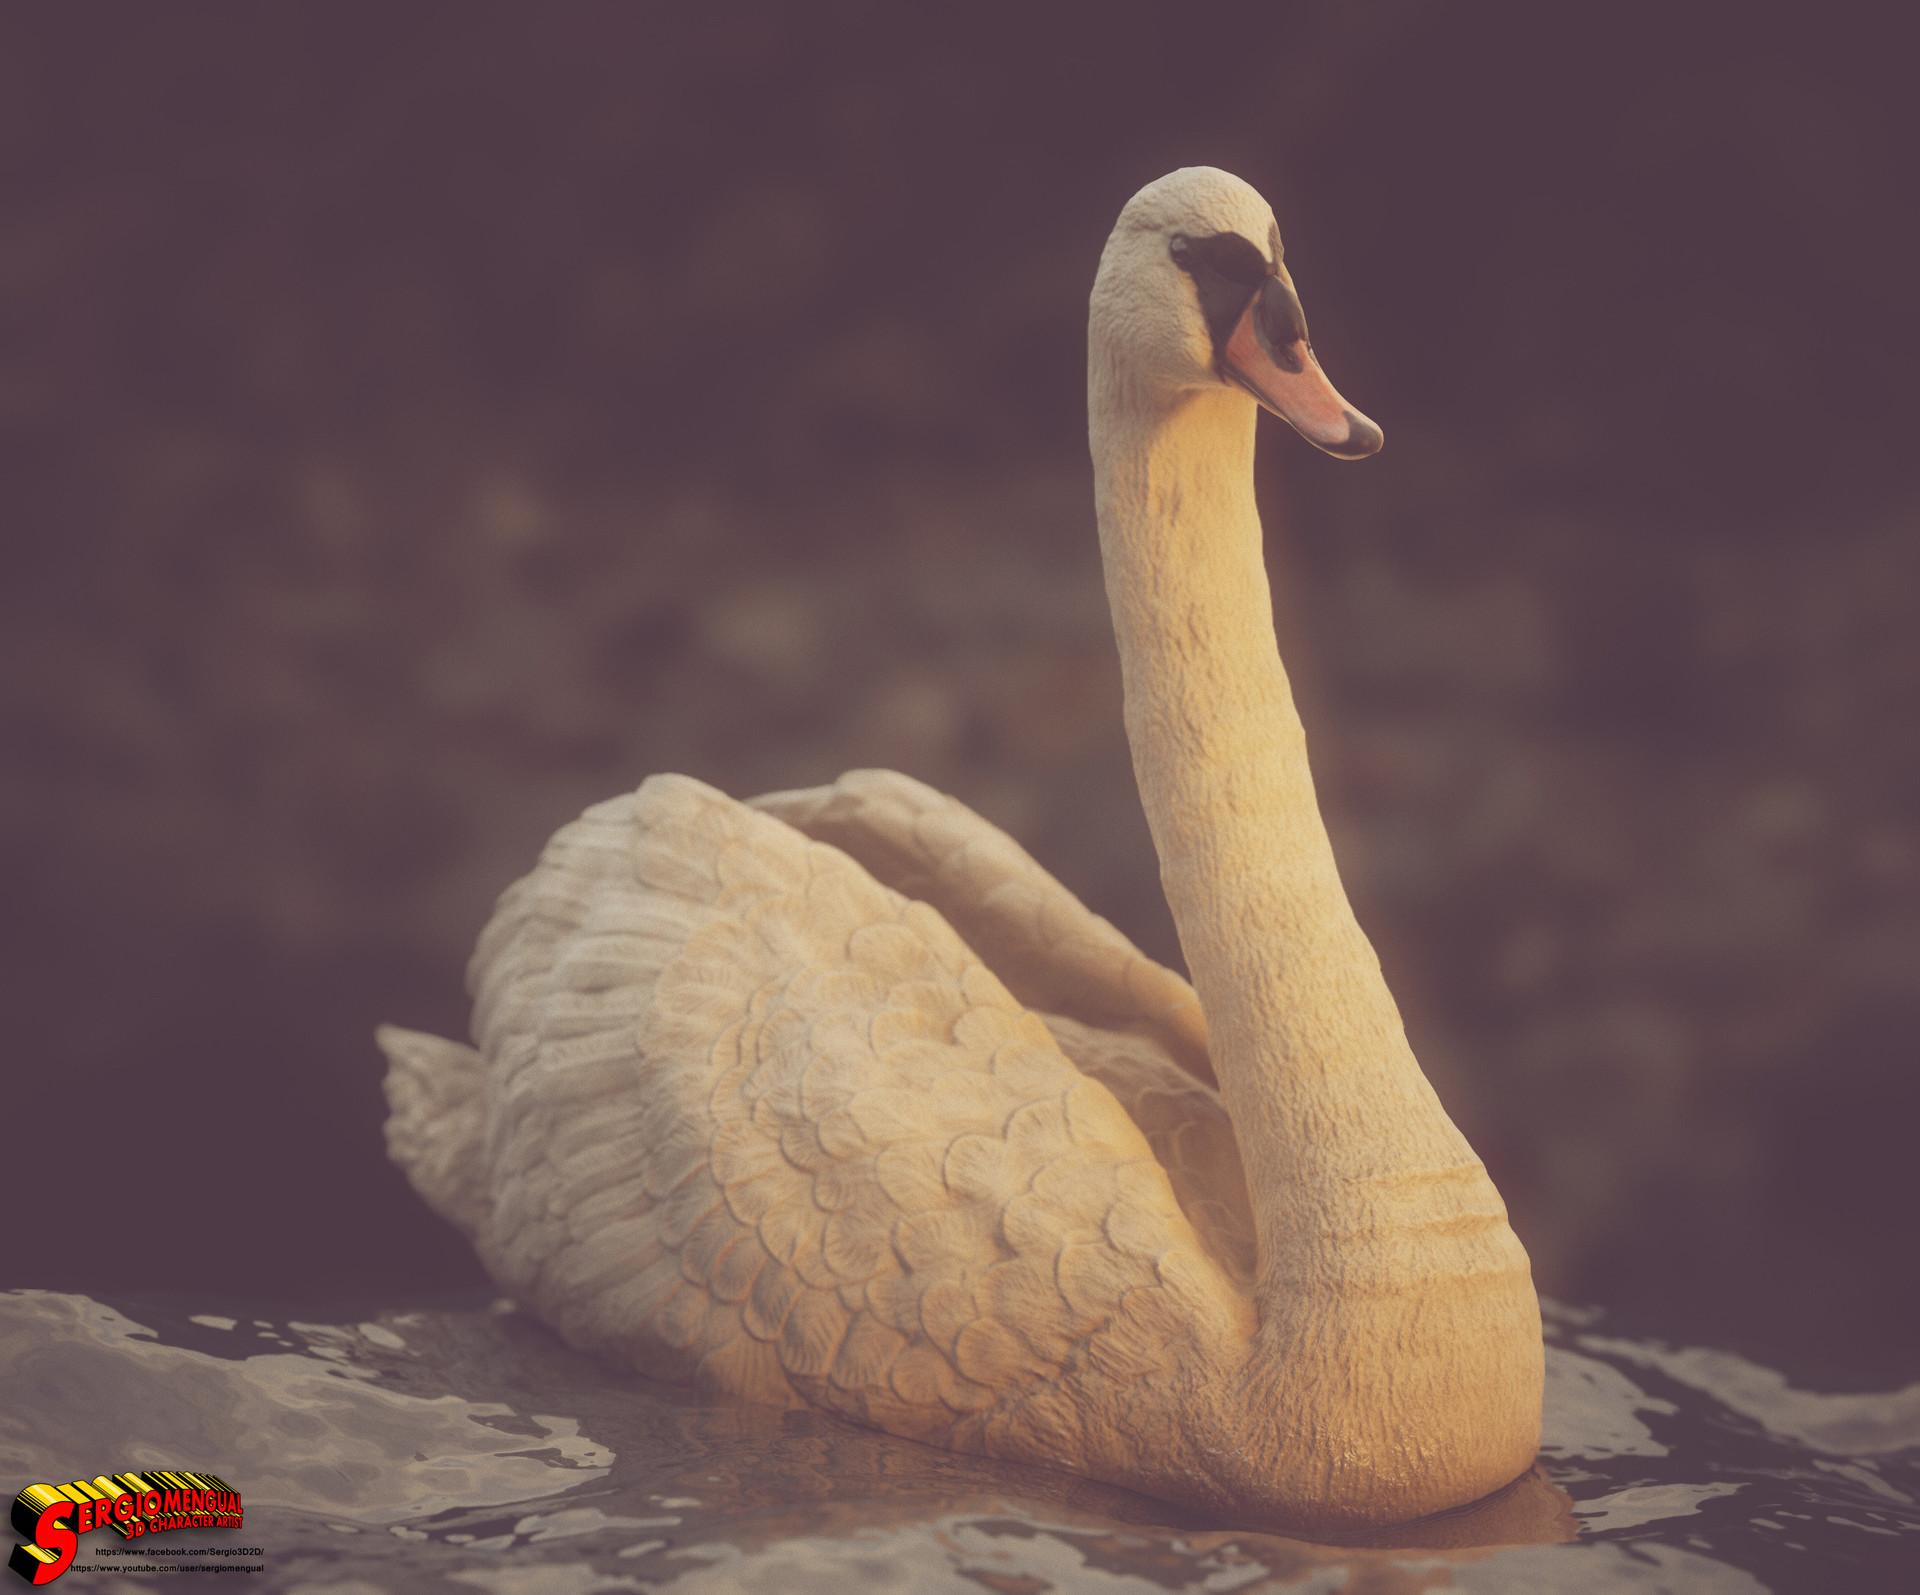 Sergio gabriel mengual swan square 2